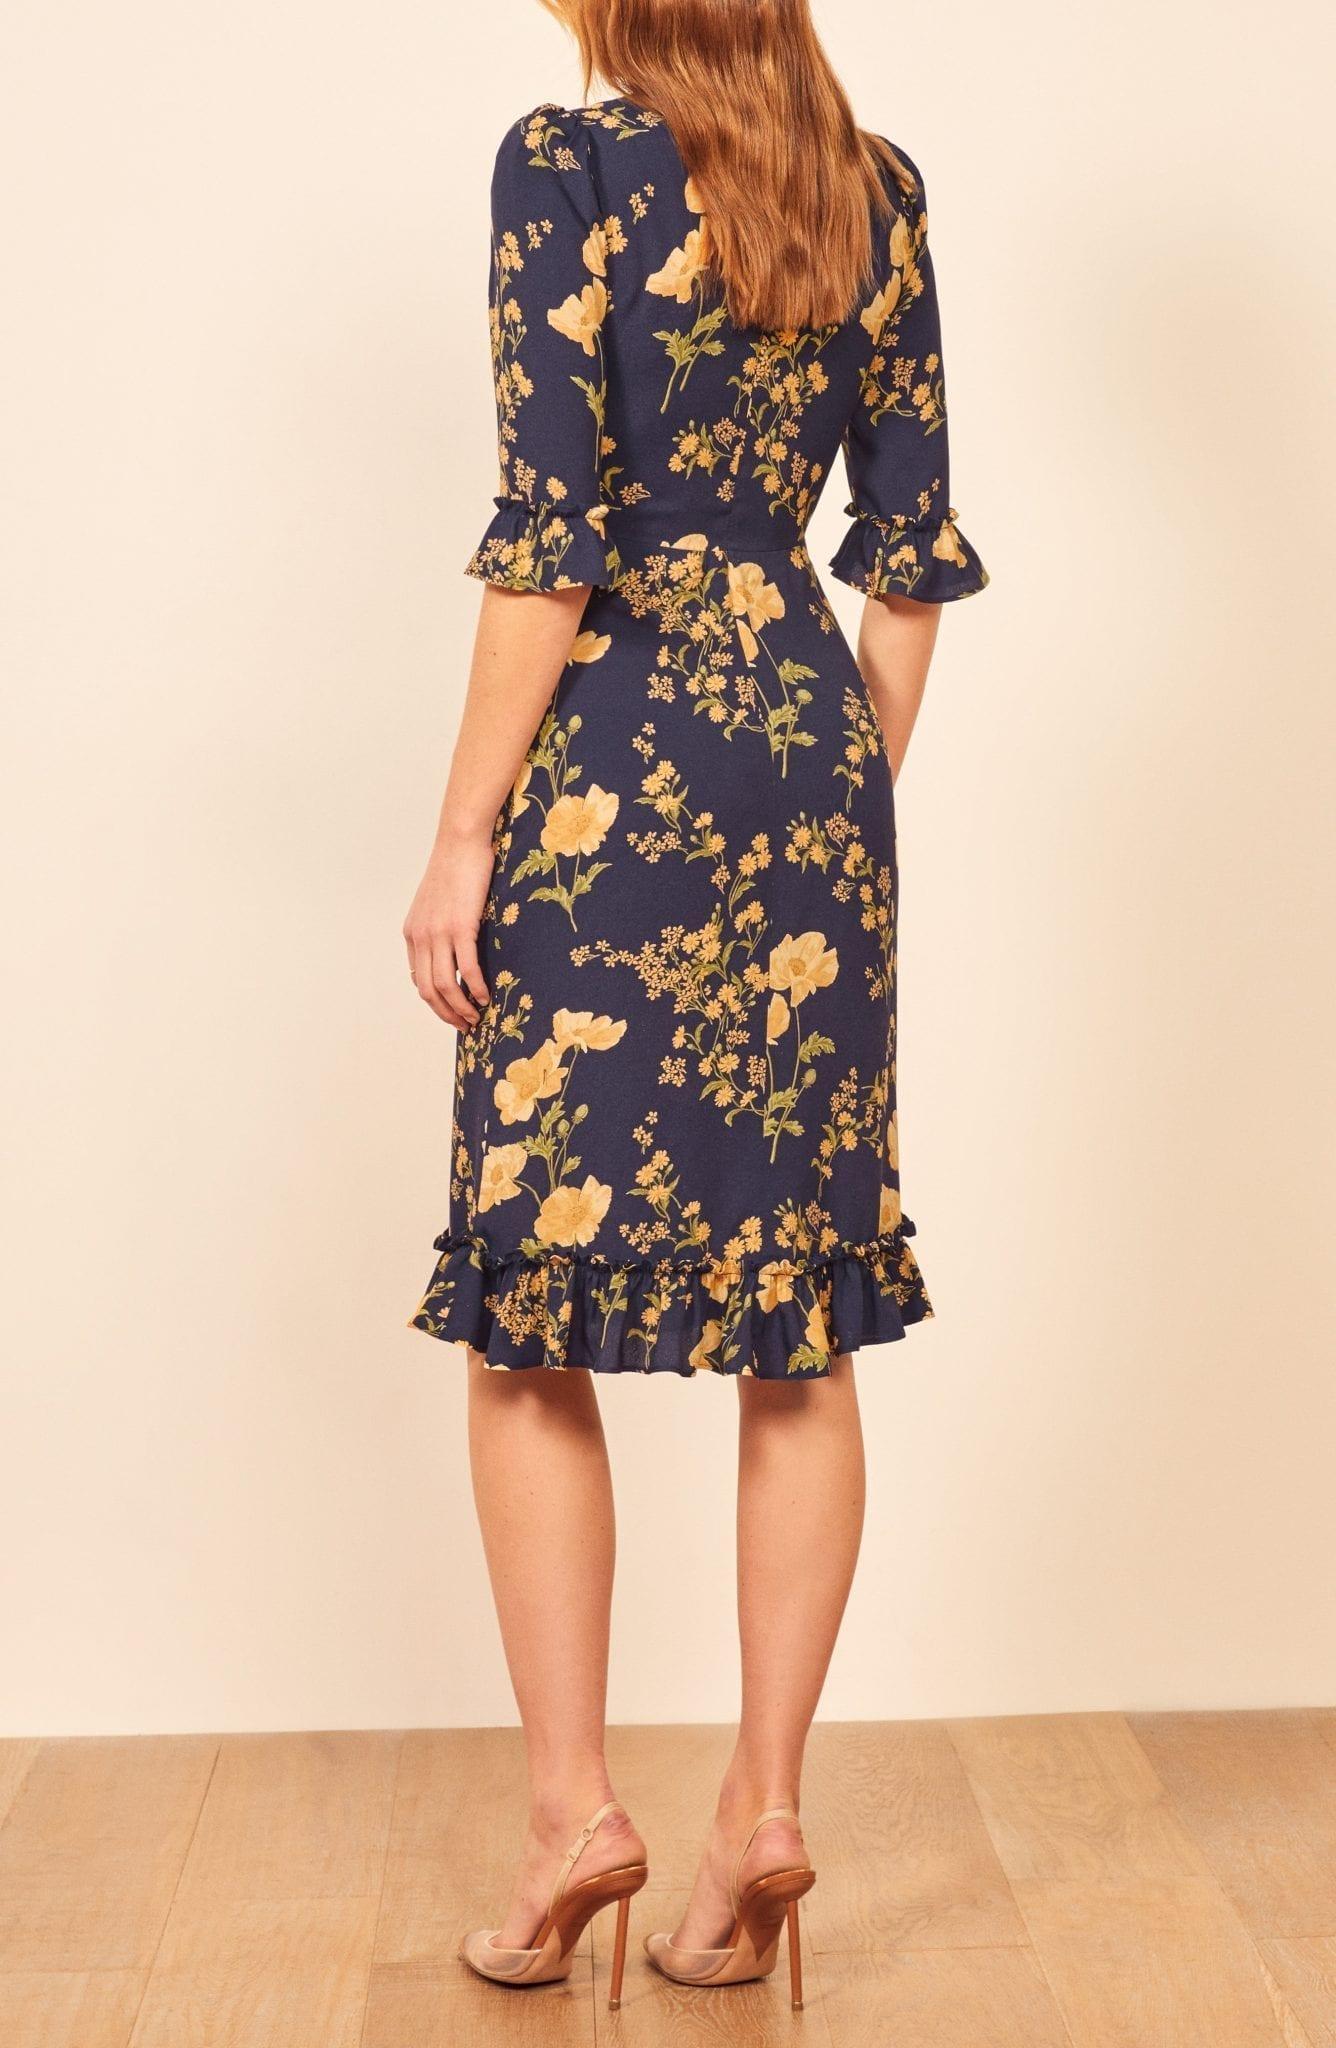 REFORMATION Hansel Floral Sheath Dress